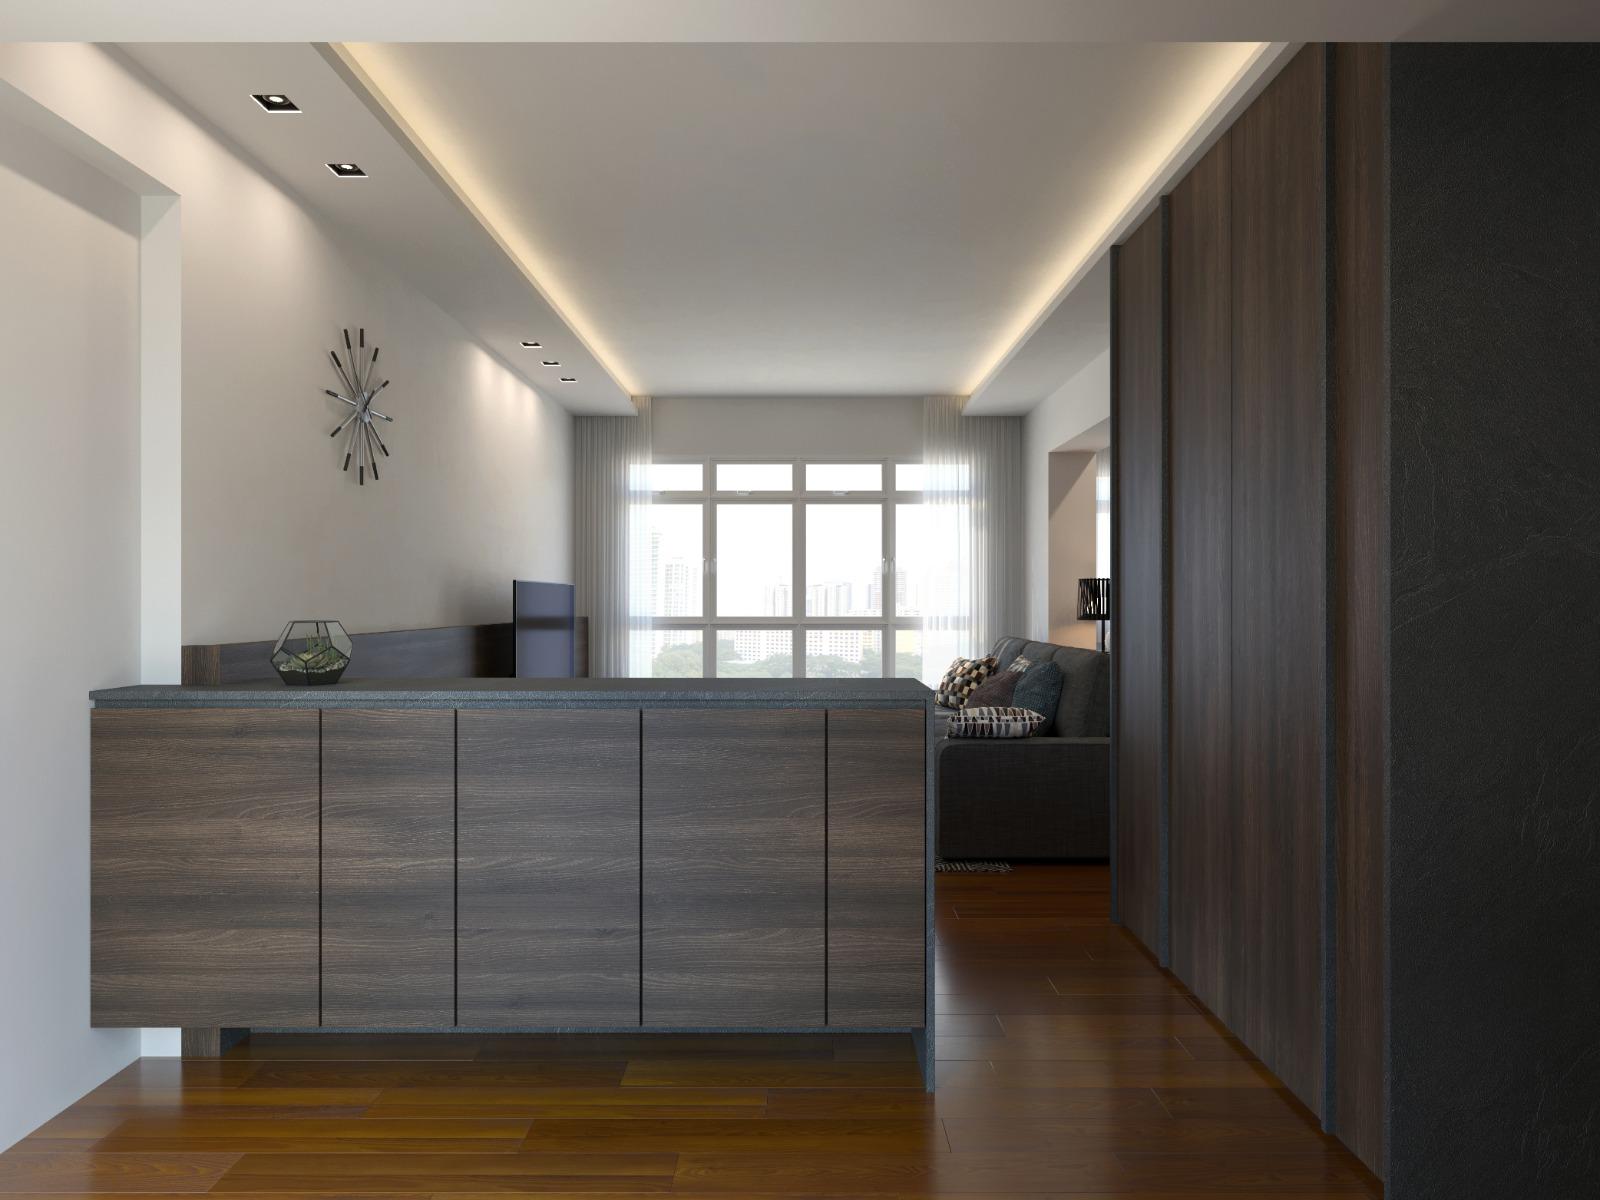 01 - Foyer